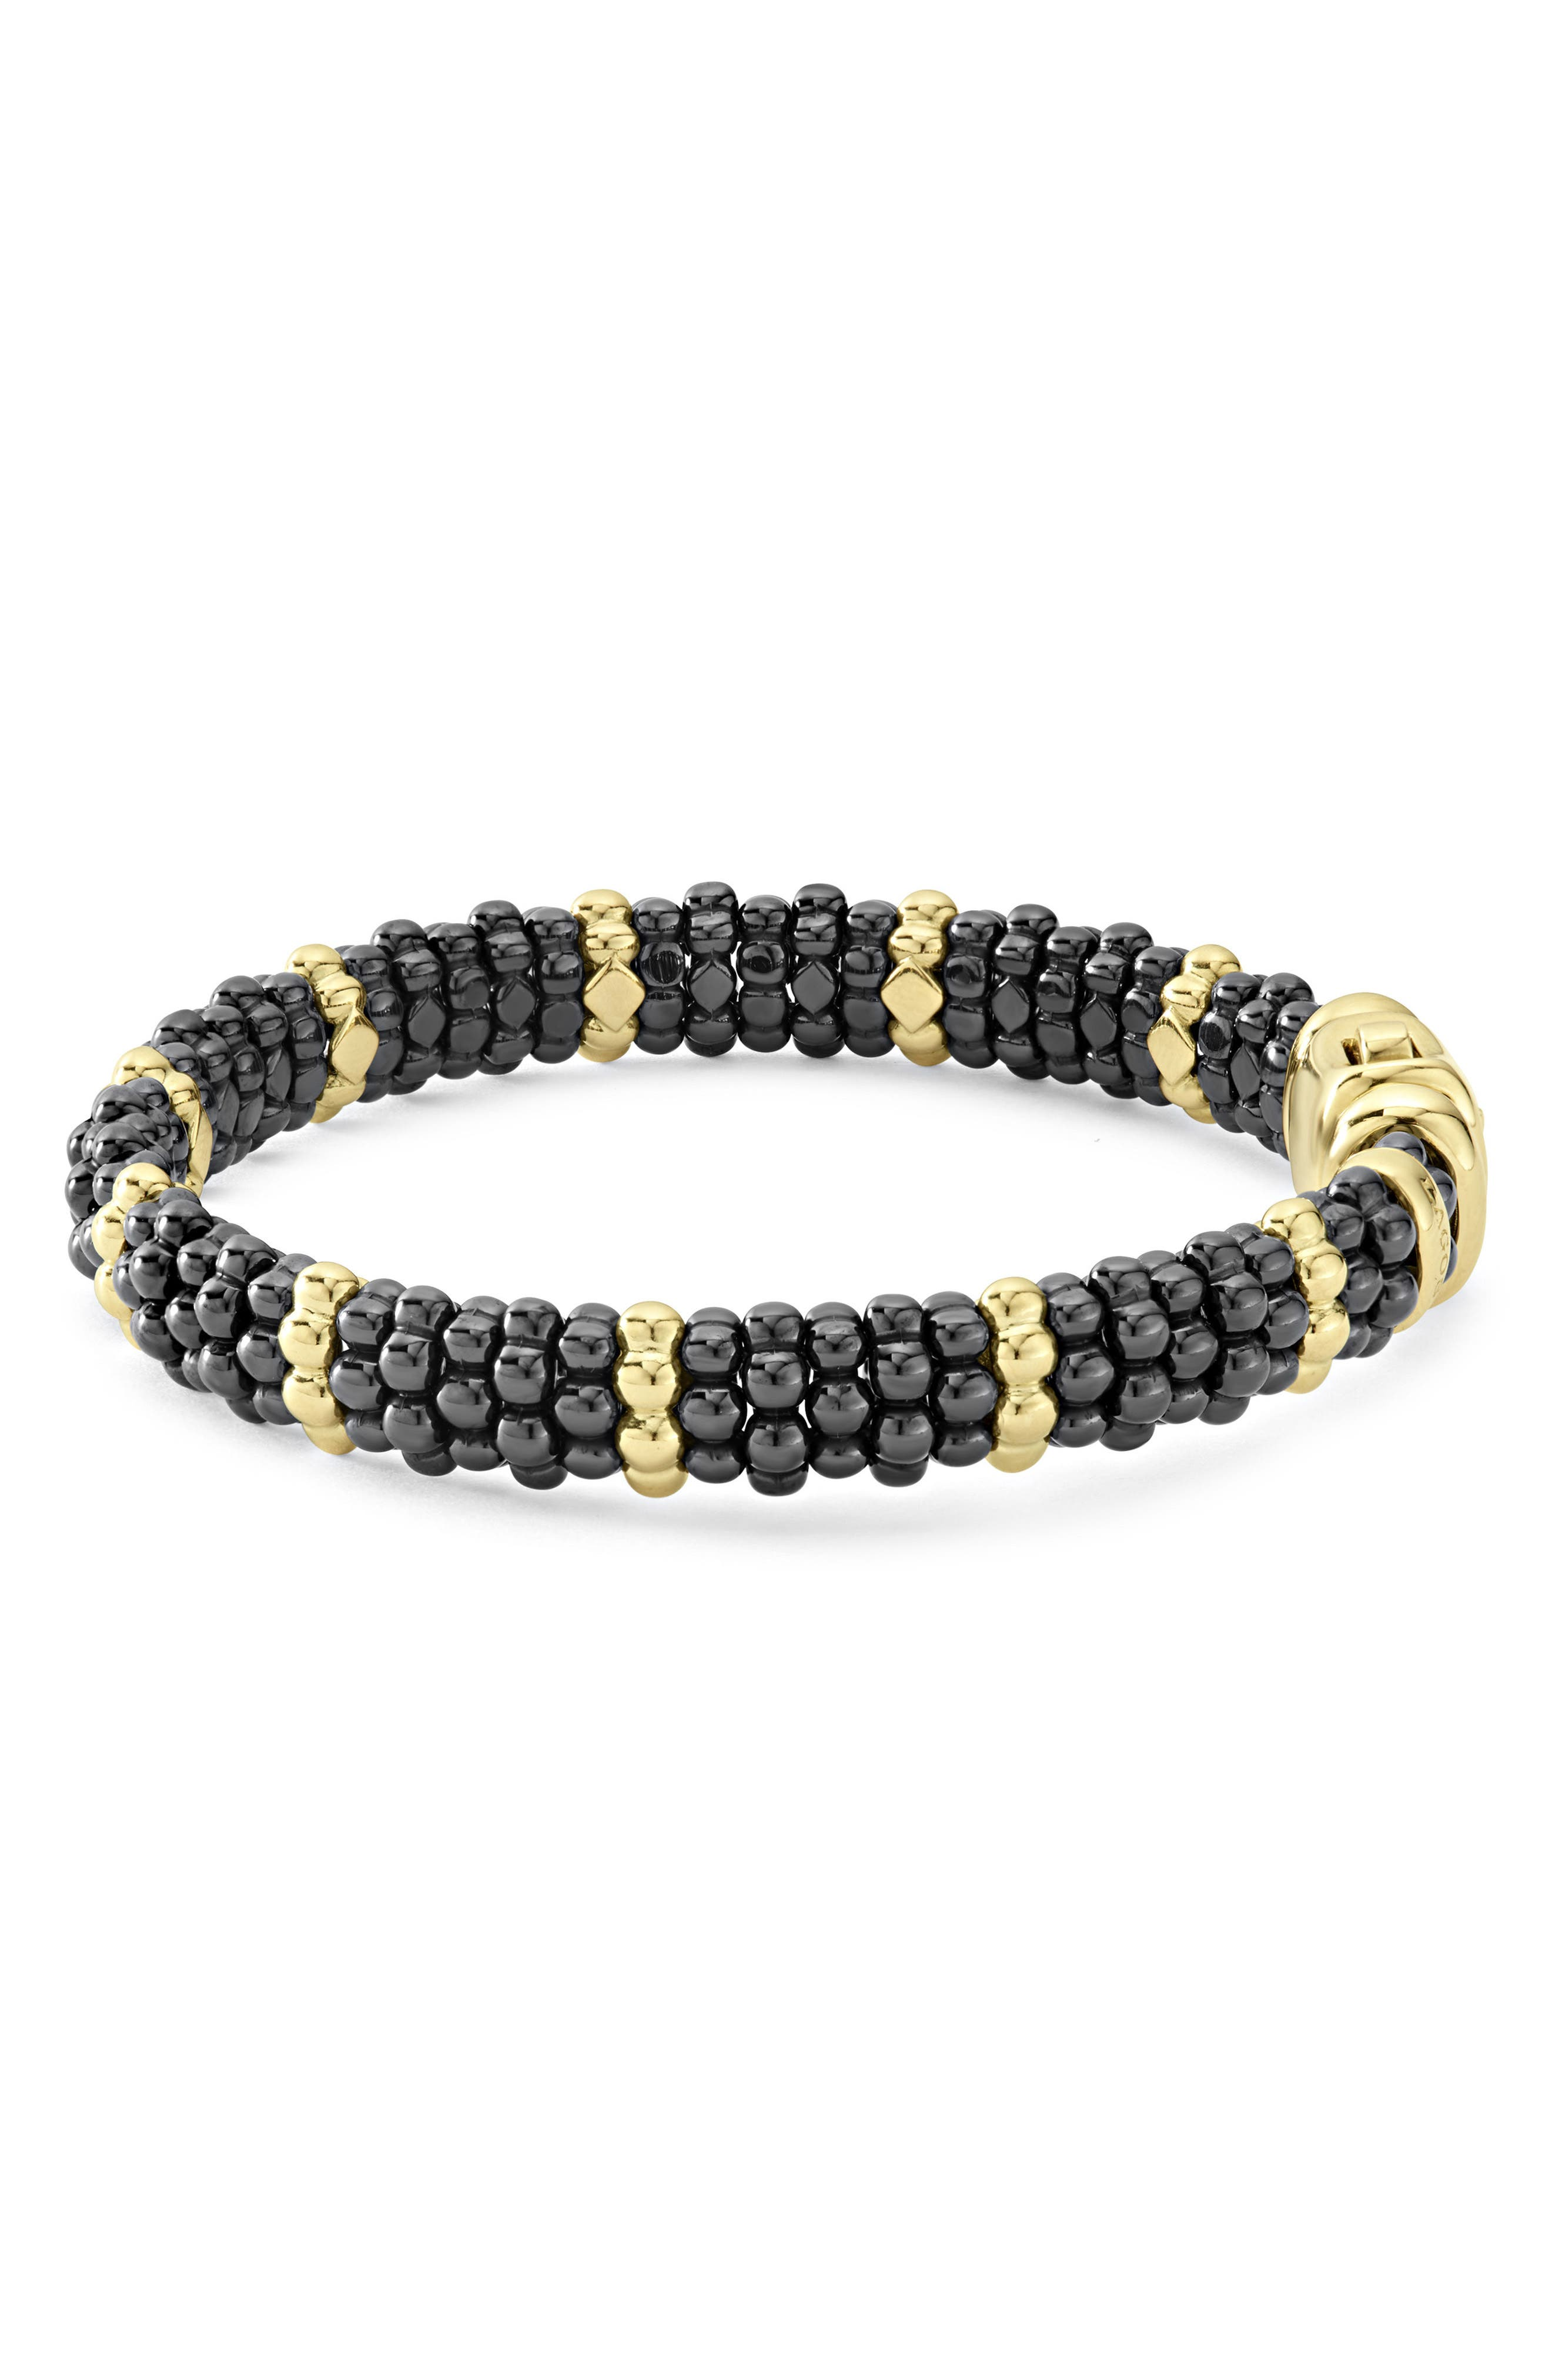 Gold & Black Caviar Station Bracelet,                             Alternate thumbnail 5, color,                             GOLD/ BLACK